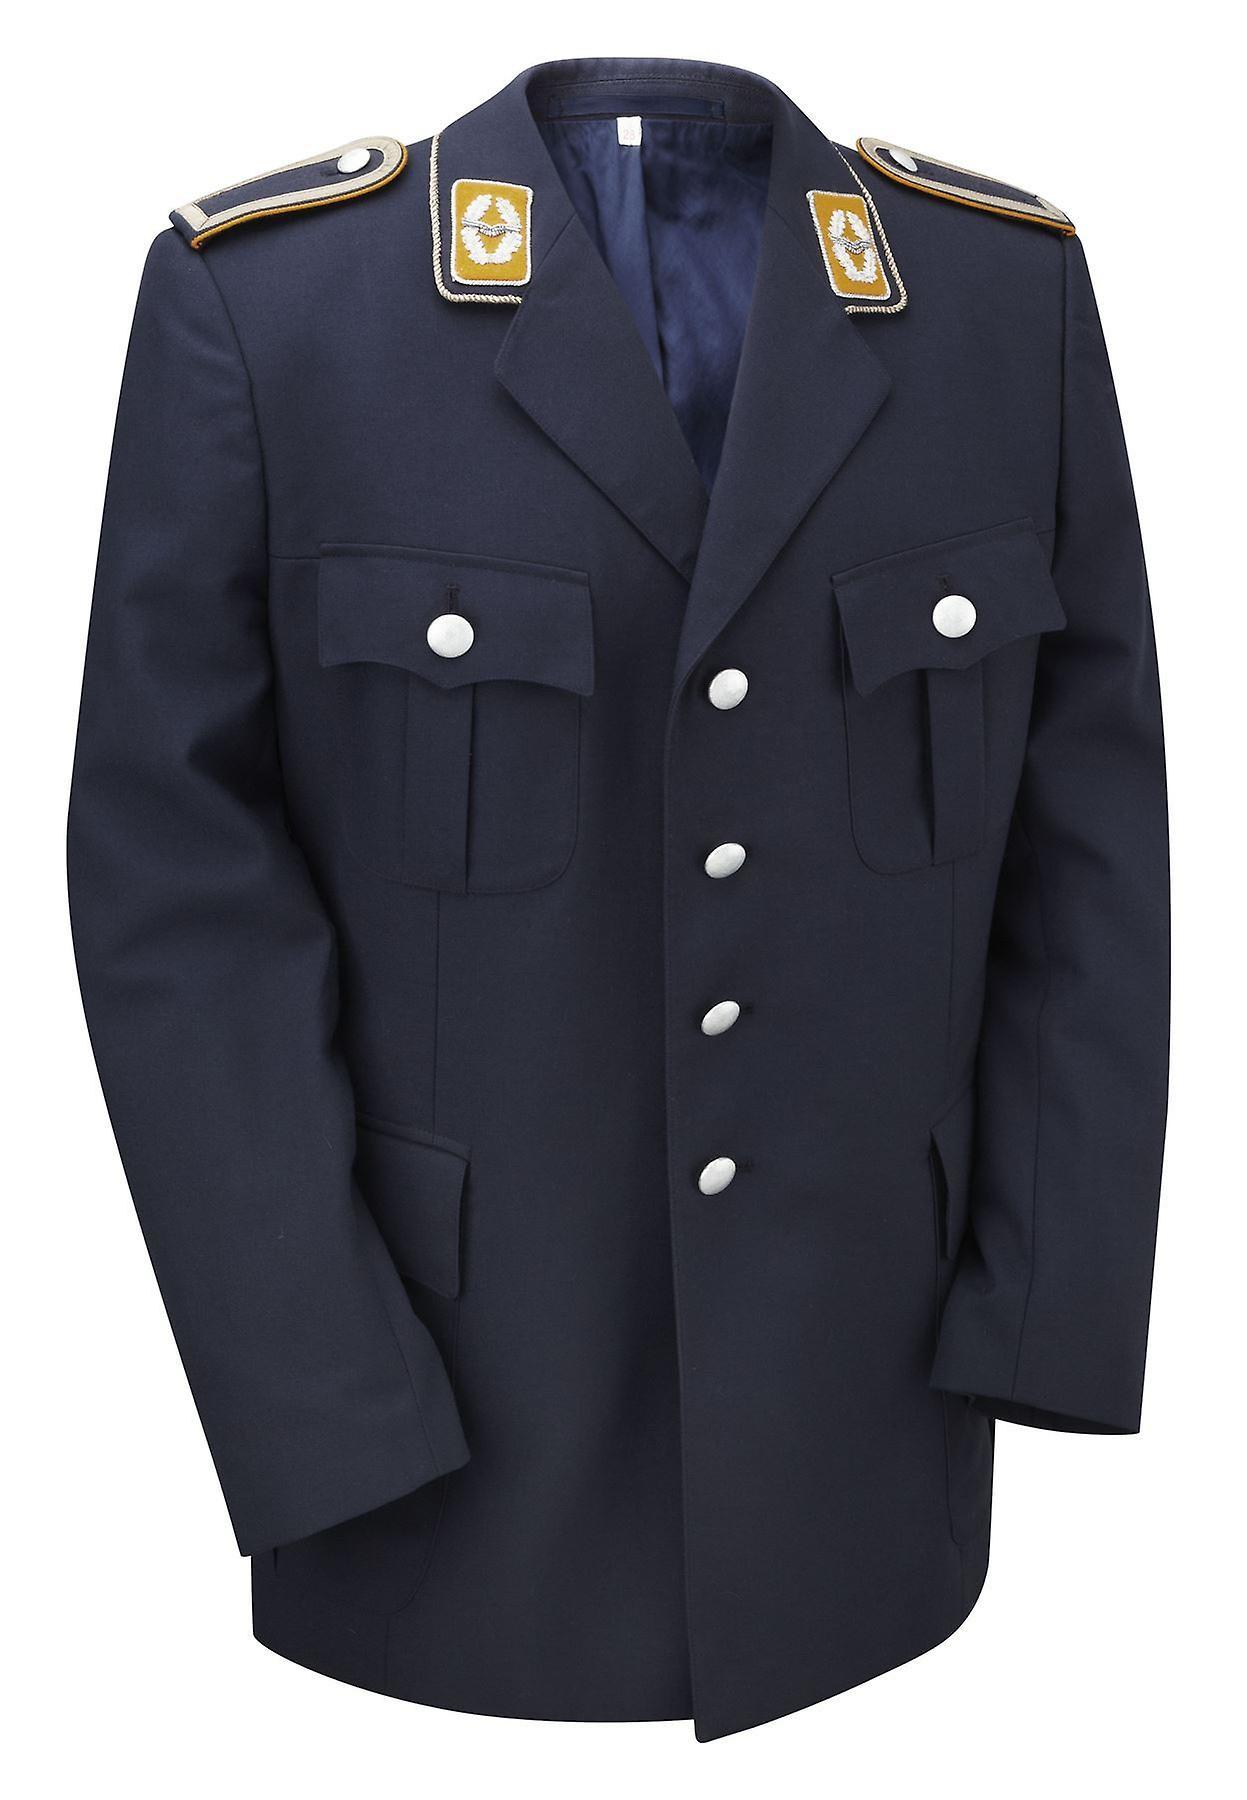 Gerhomme Military émis veste marine de Luftwaffe